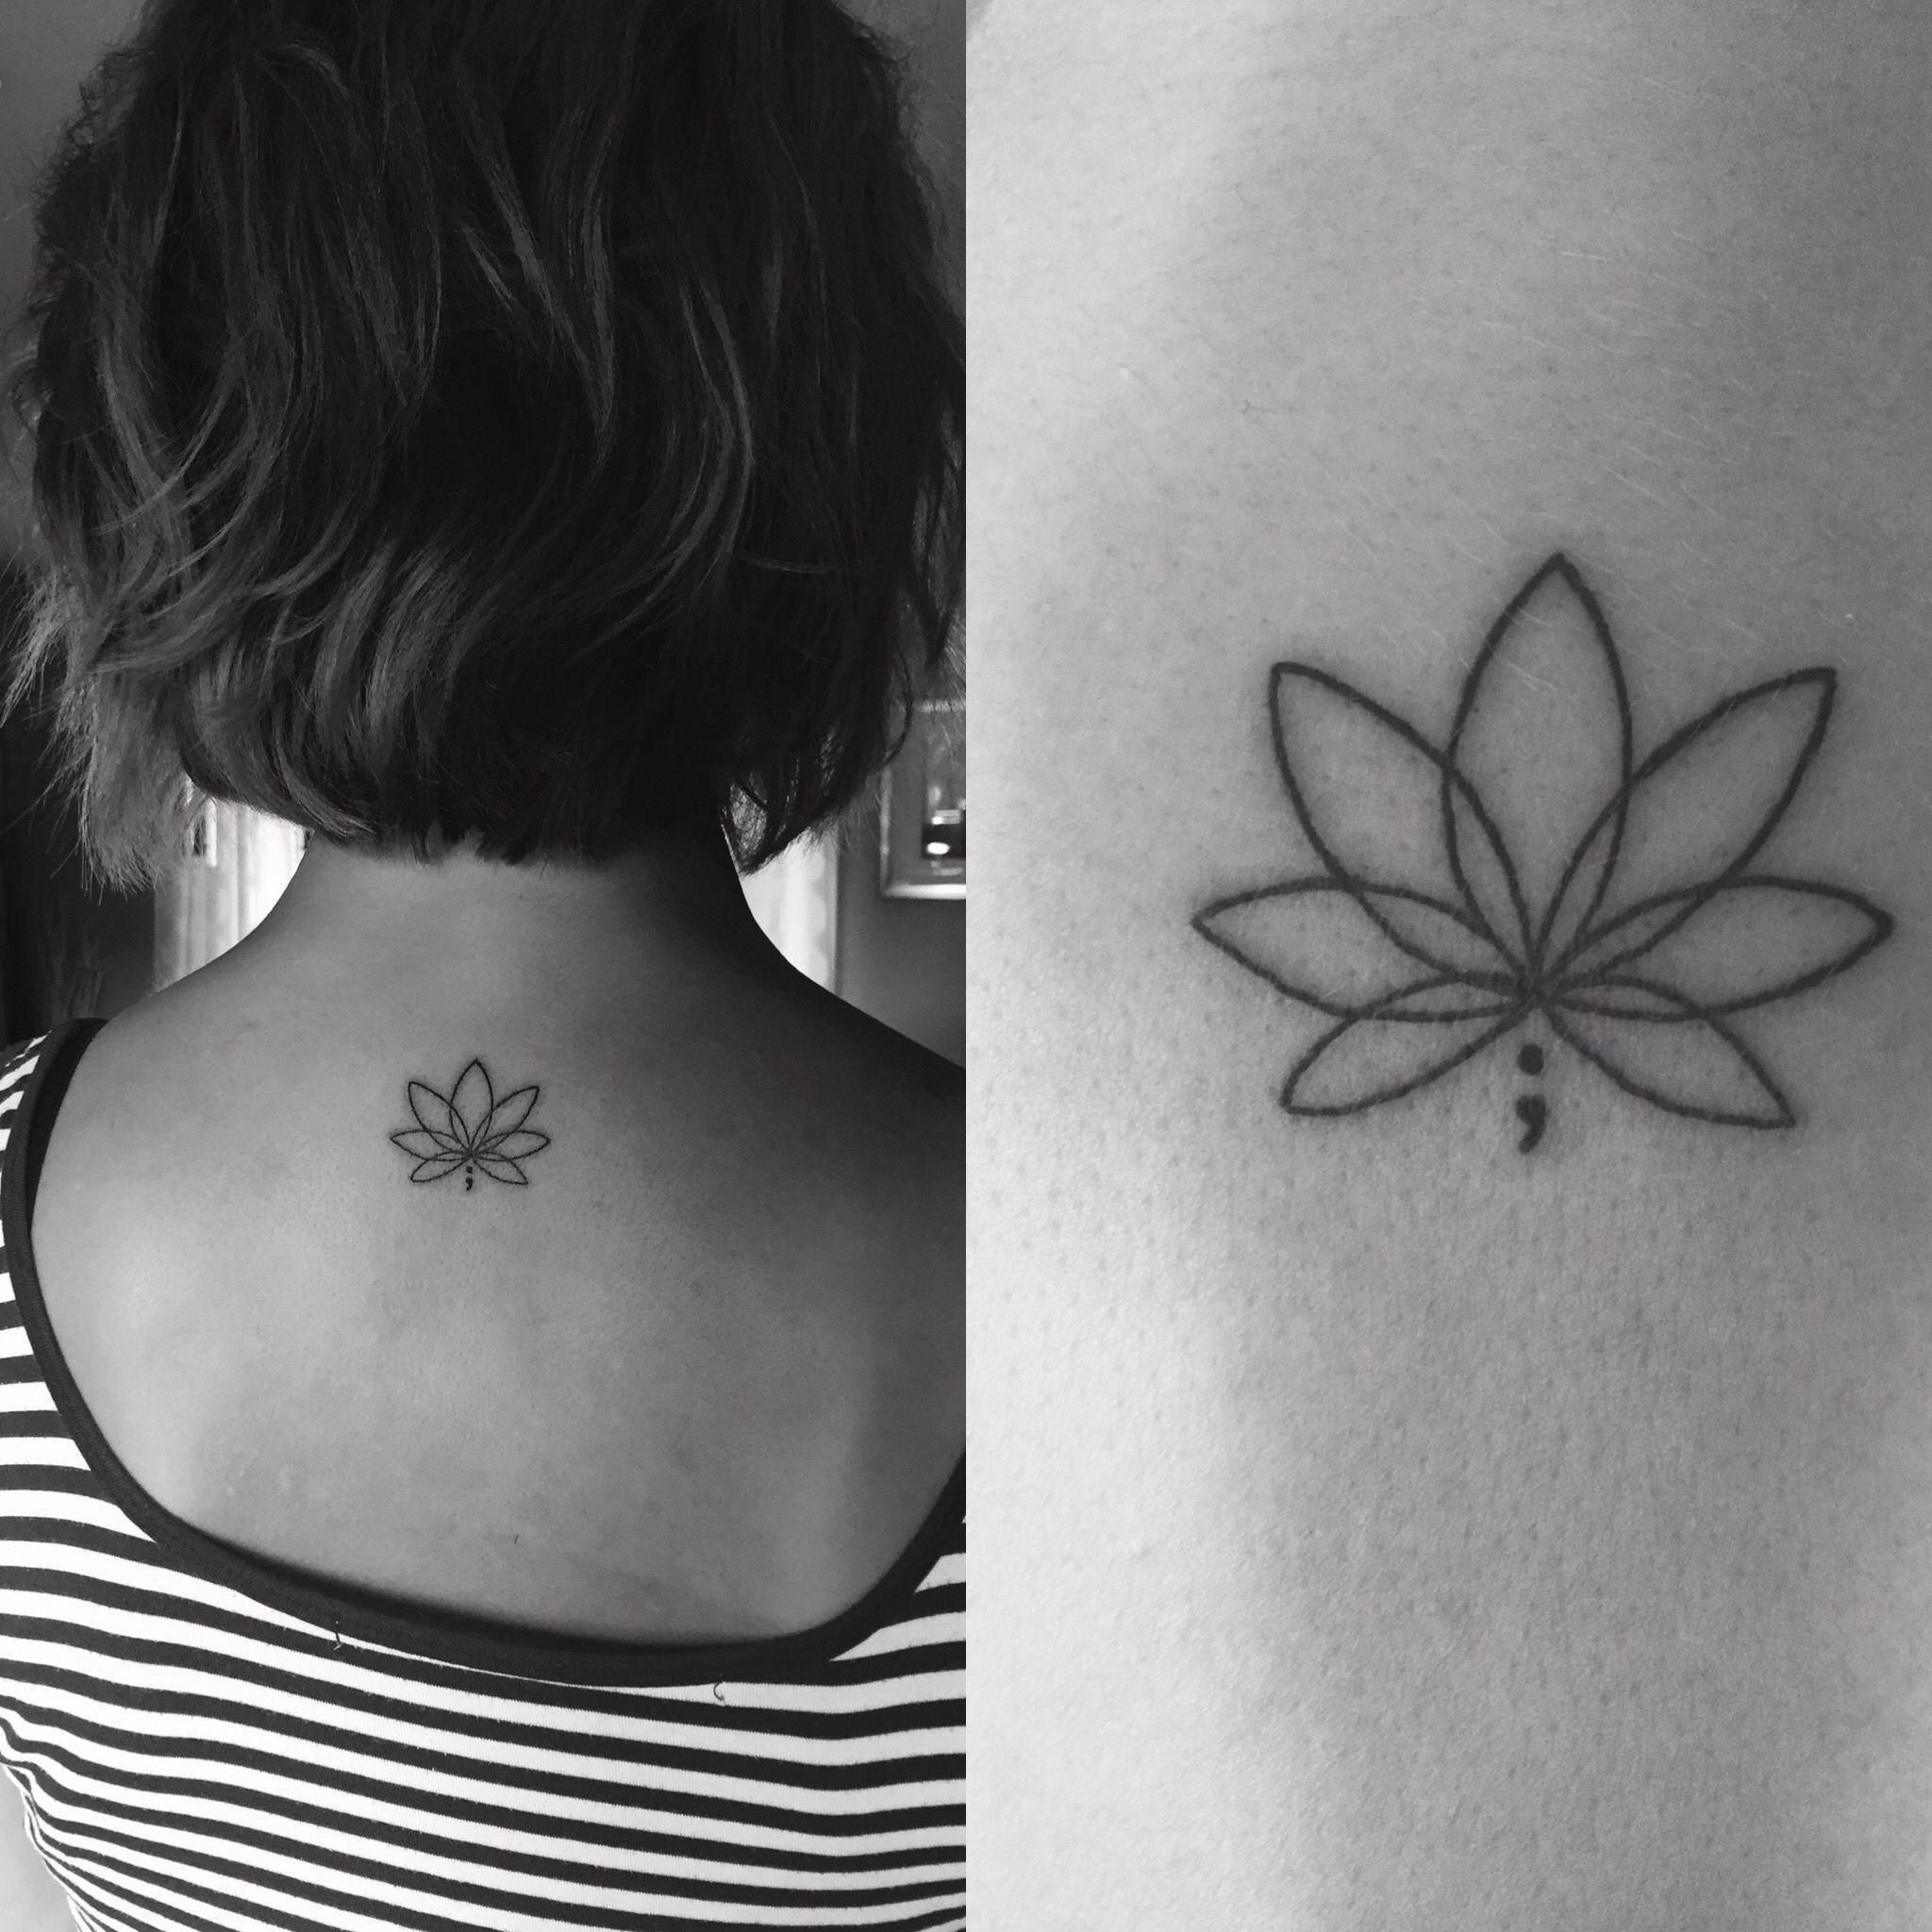 japanese tattoos symbols and meaning Japanesetattoos